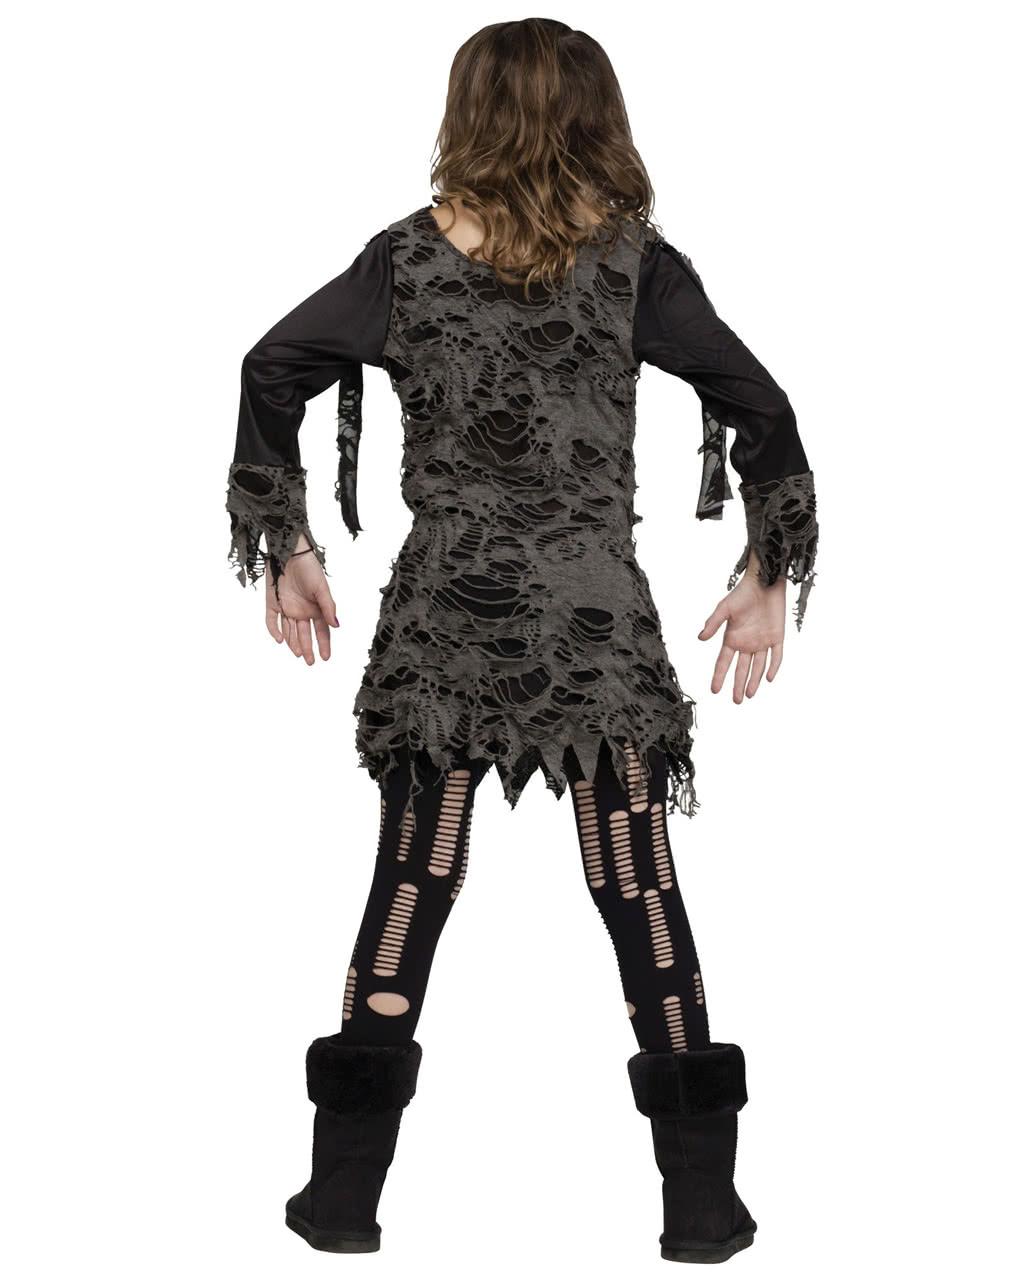 walking zombie kost m f r m dchen halloween kost m. Black Bedroom Furniture Sets. Home Design Ideas